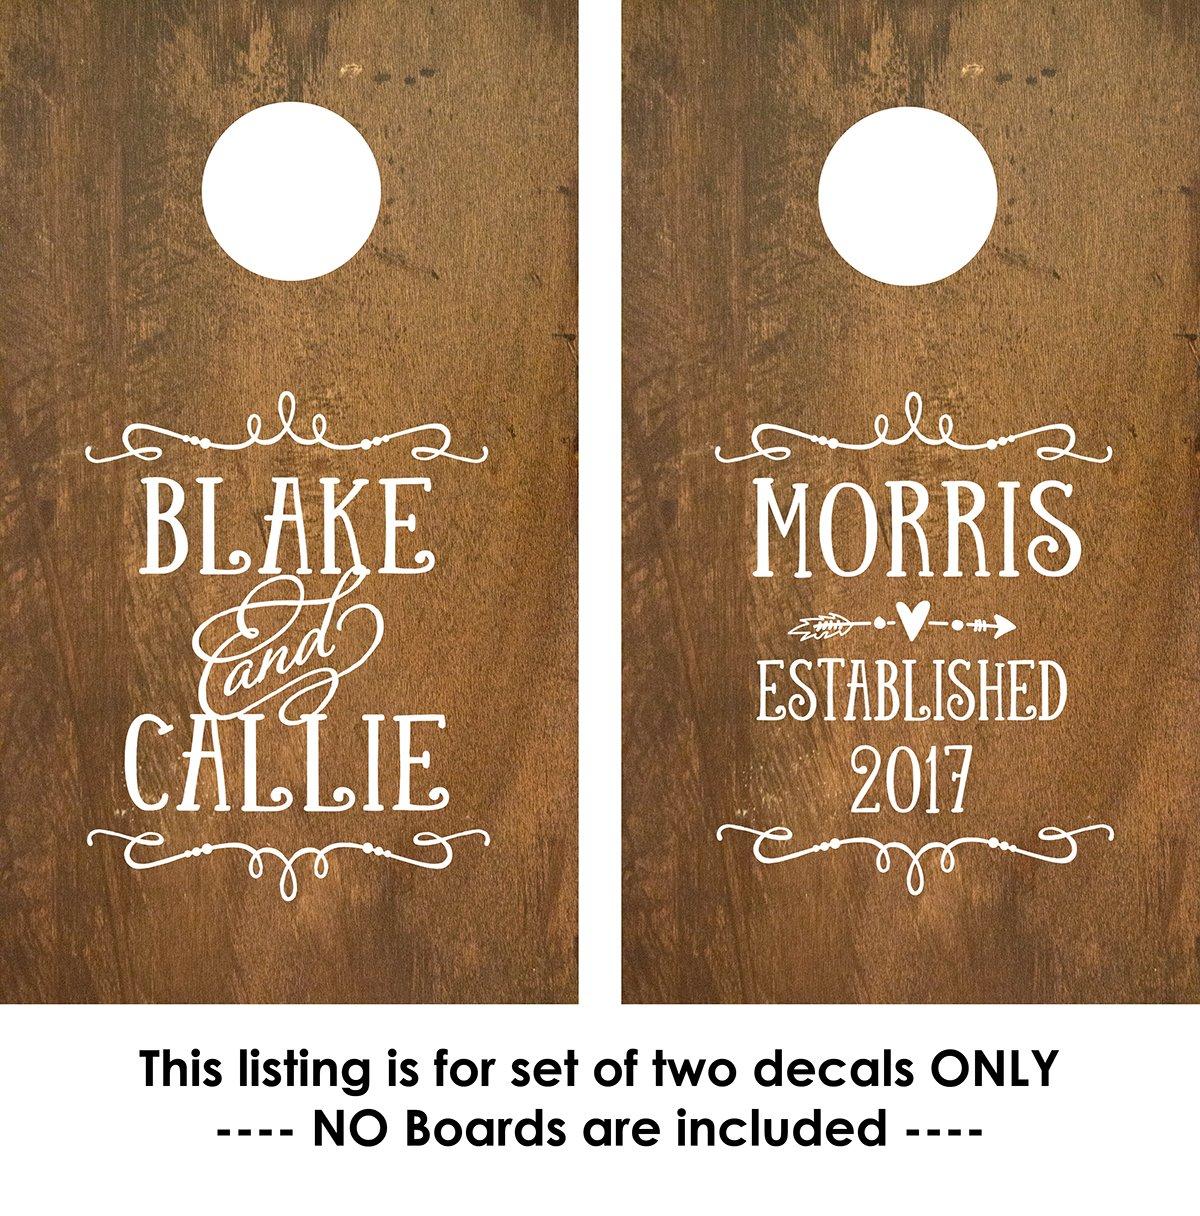 Personalized Cornhole Board Decals Stickers - Custom Wedding Monogram - 2 Decals